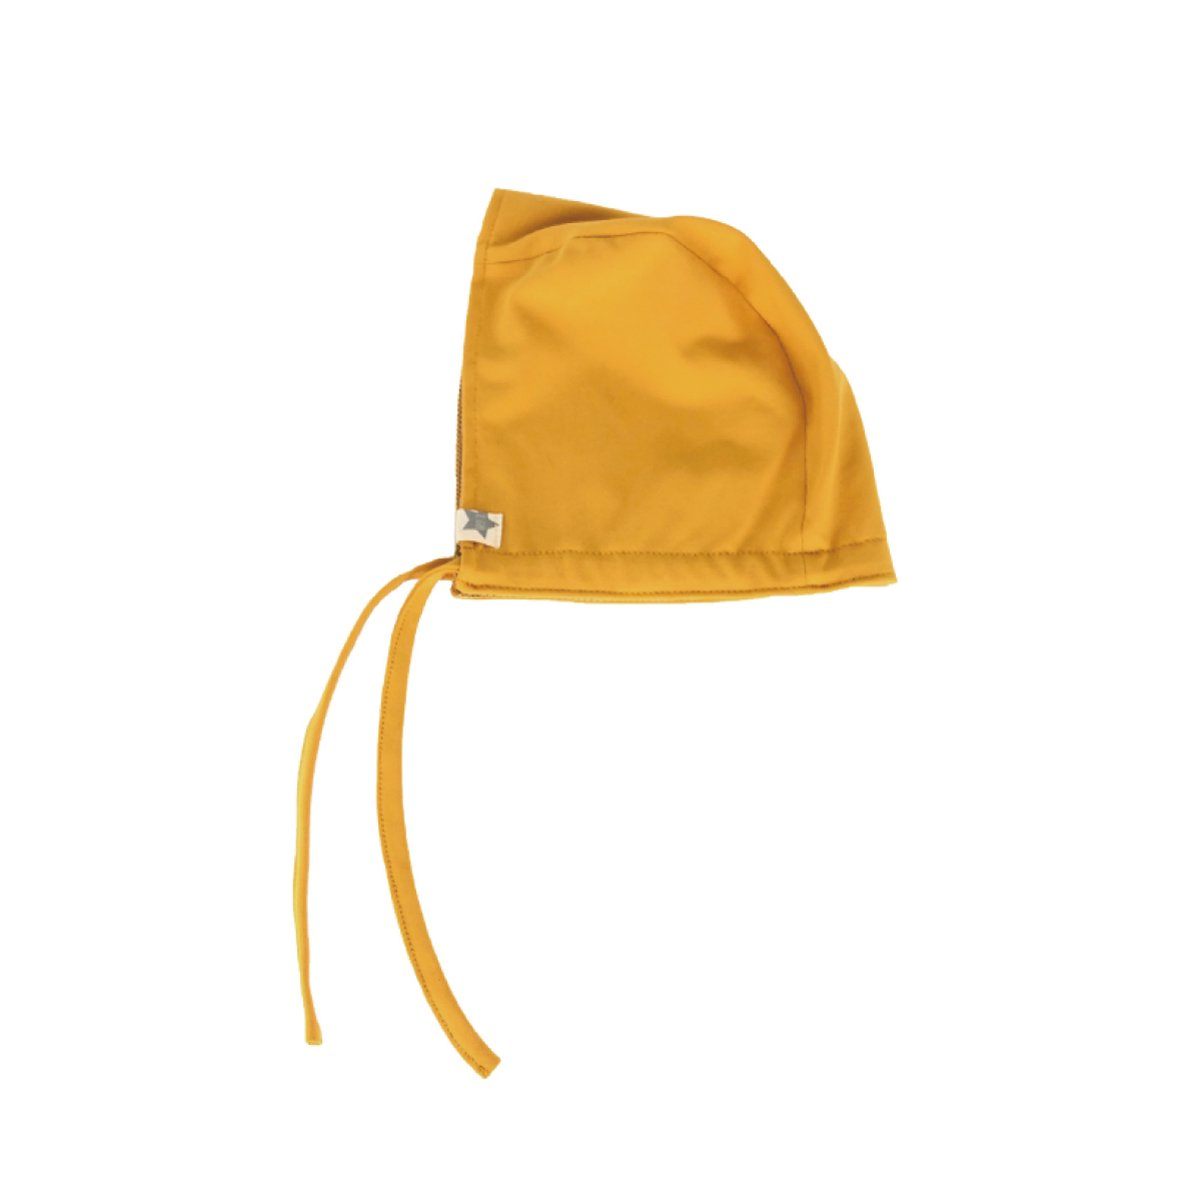 【BABY】Candy Bonnet 詳細画像2